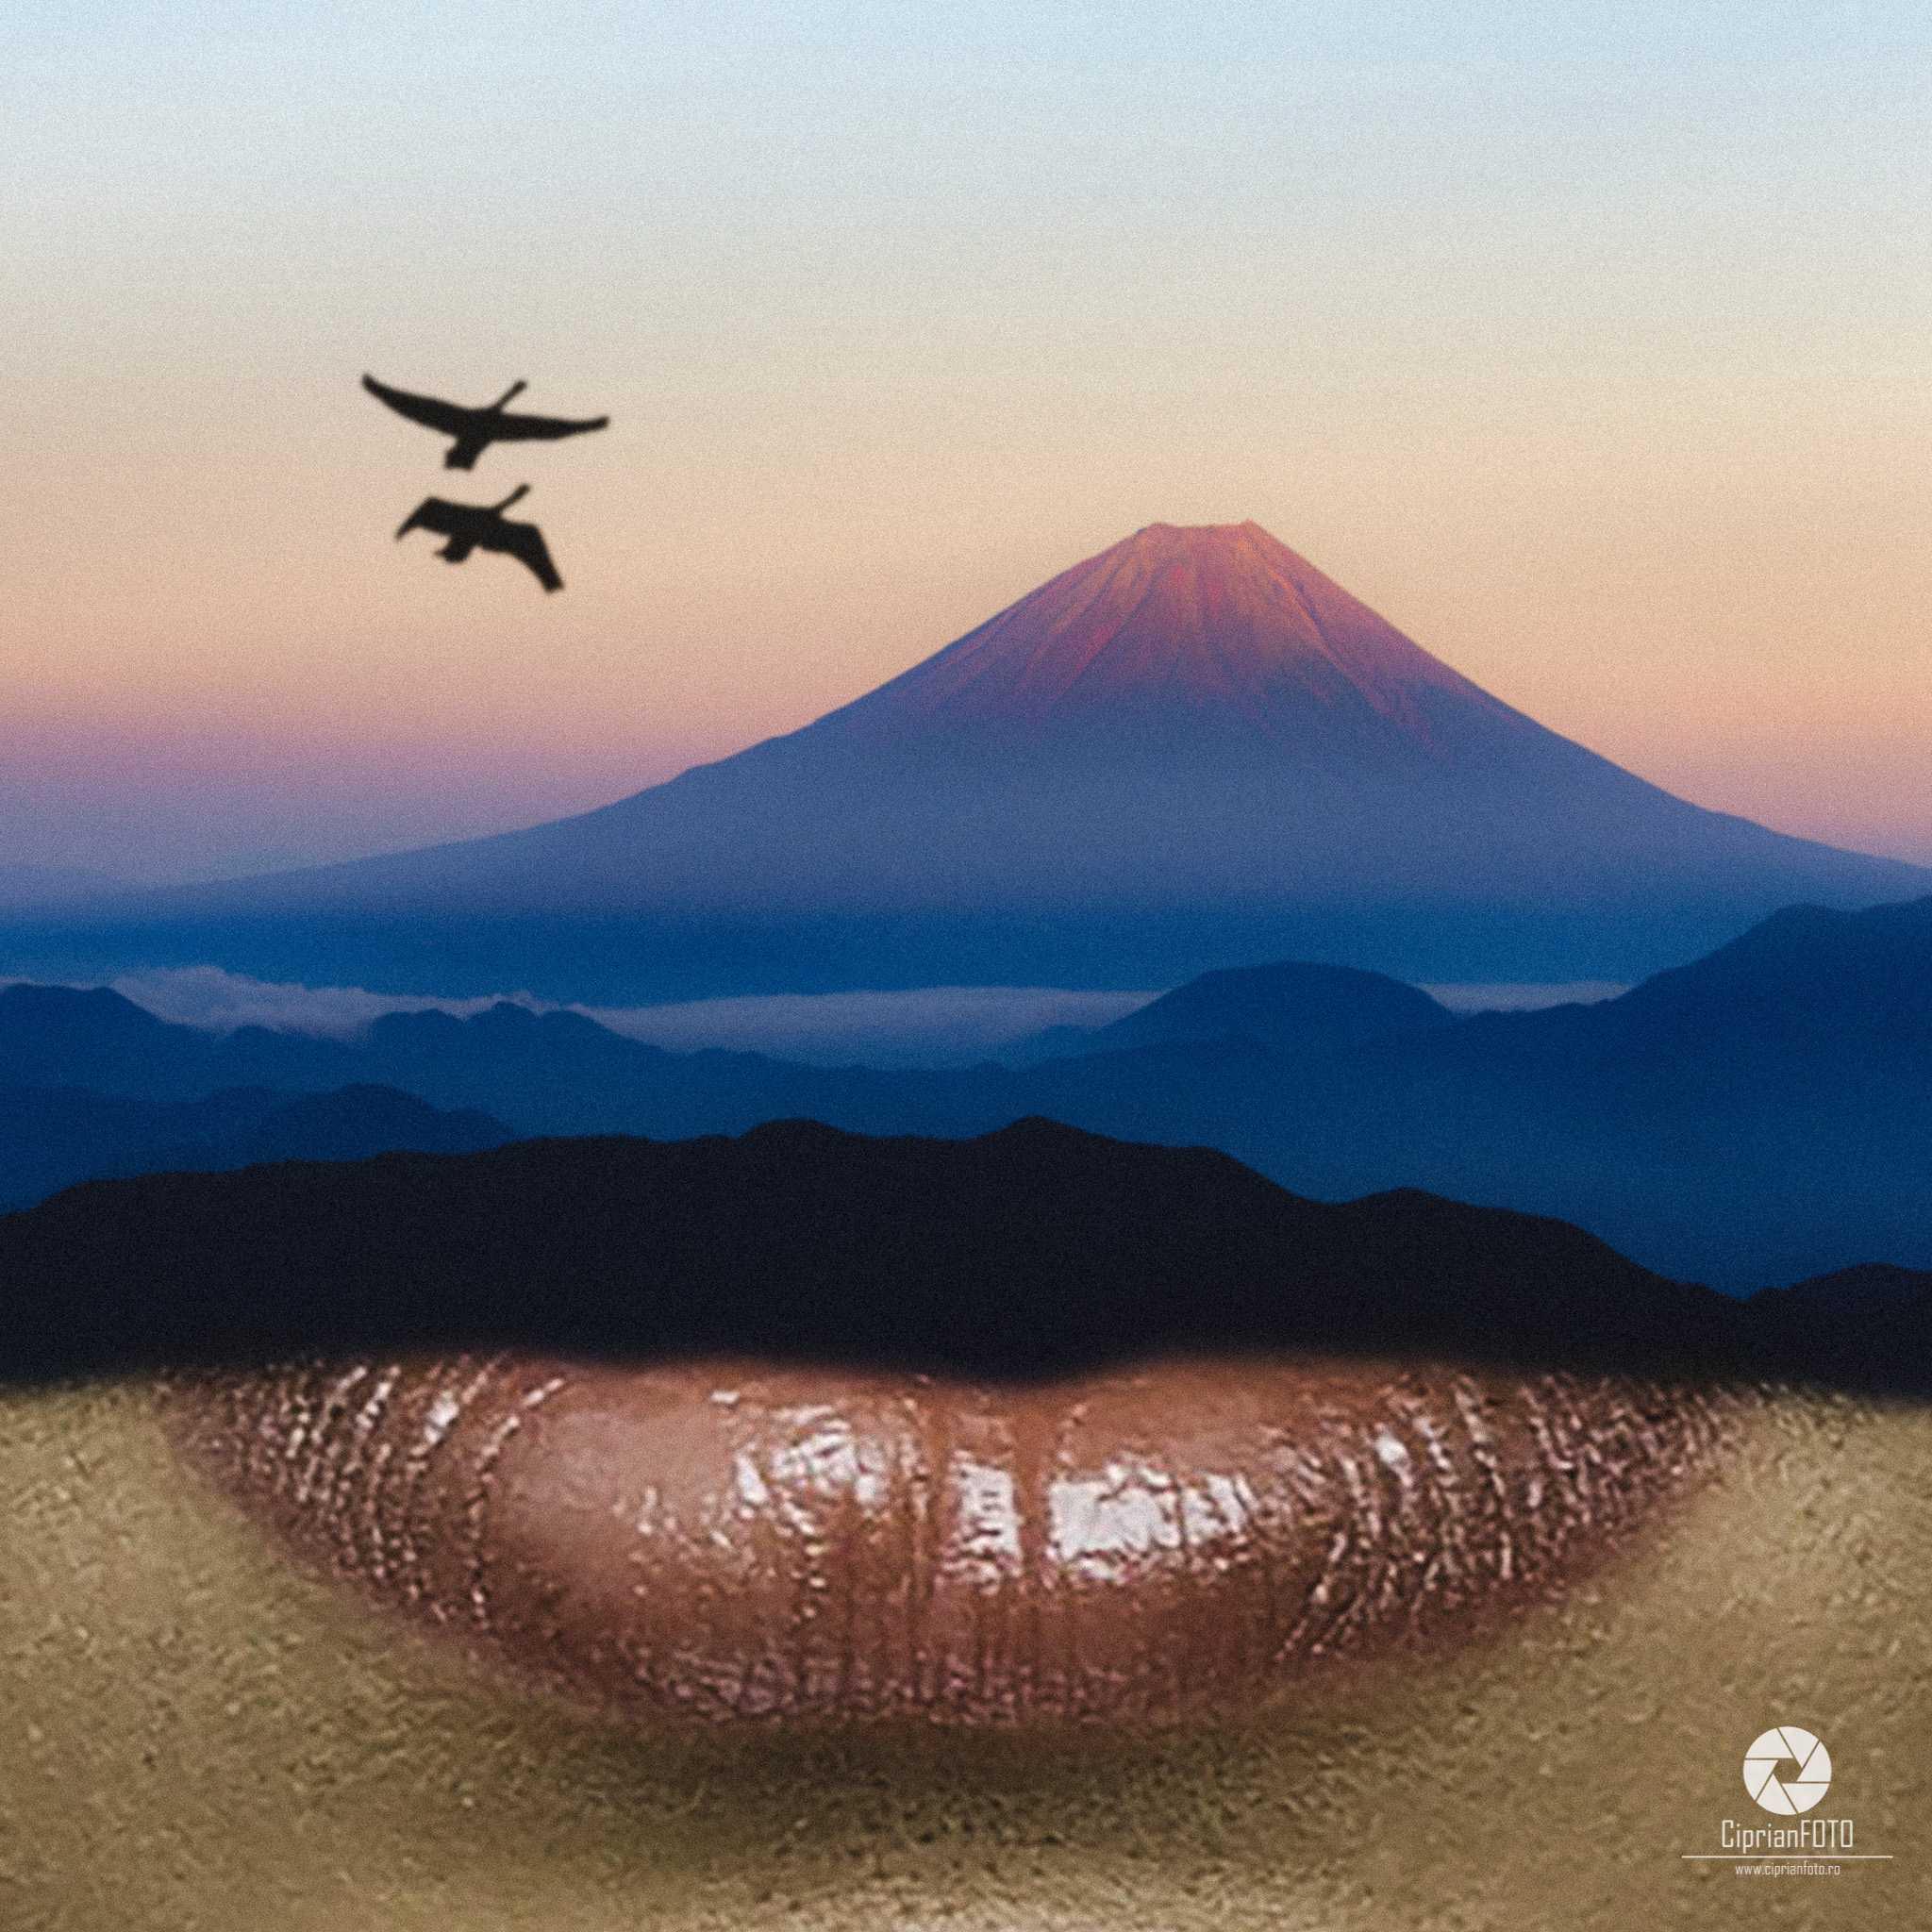 Landscape Mouth, Photoshop Manipulation Tutorial, CiprianFOTO